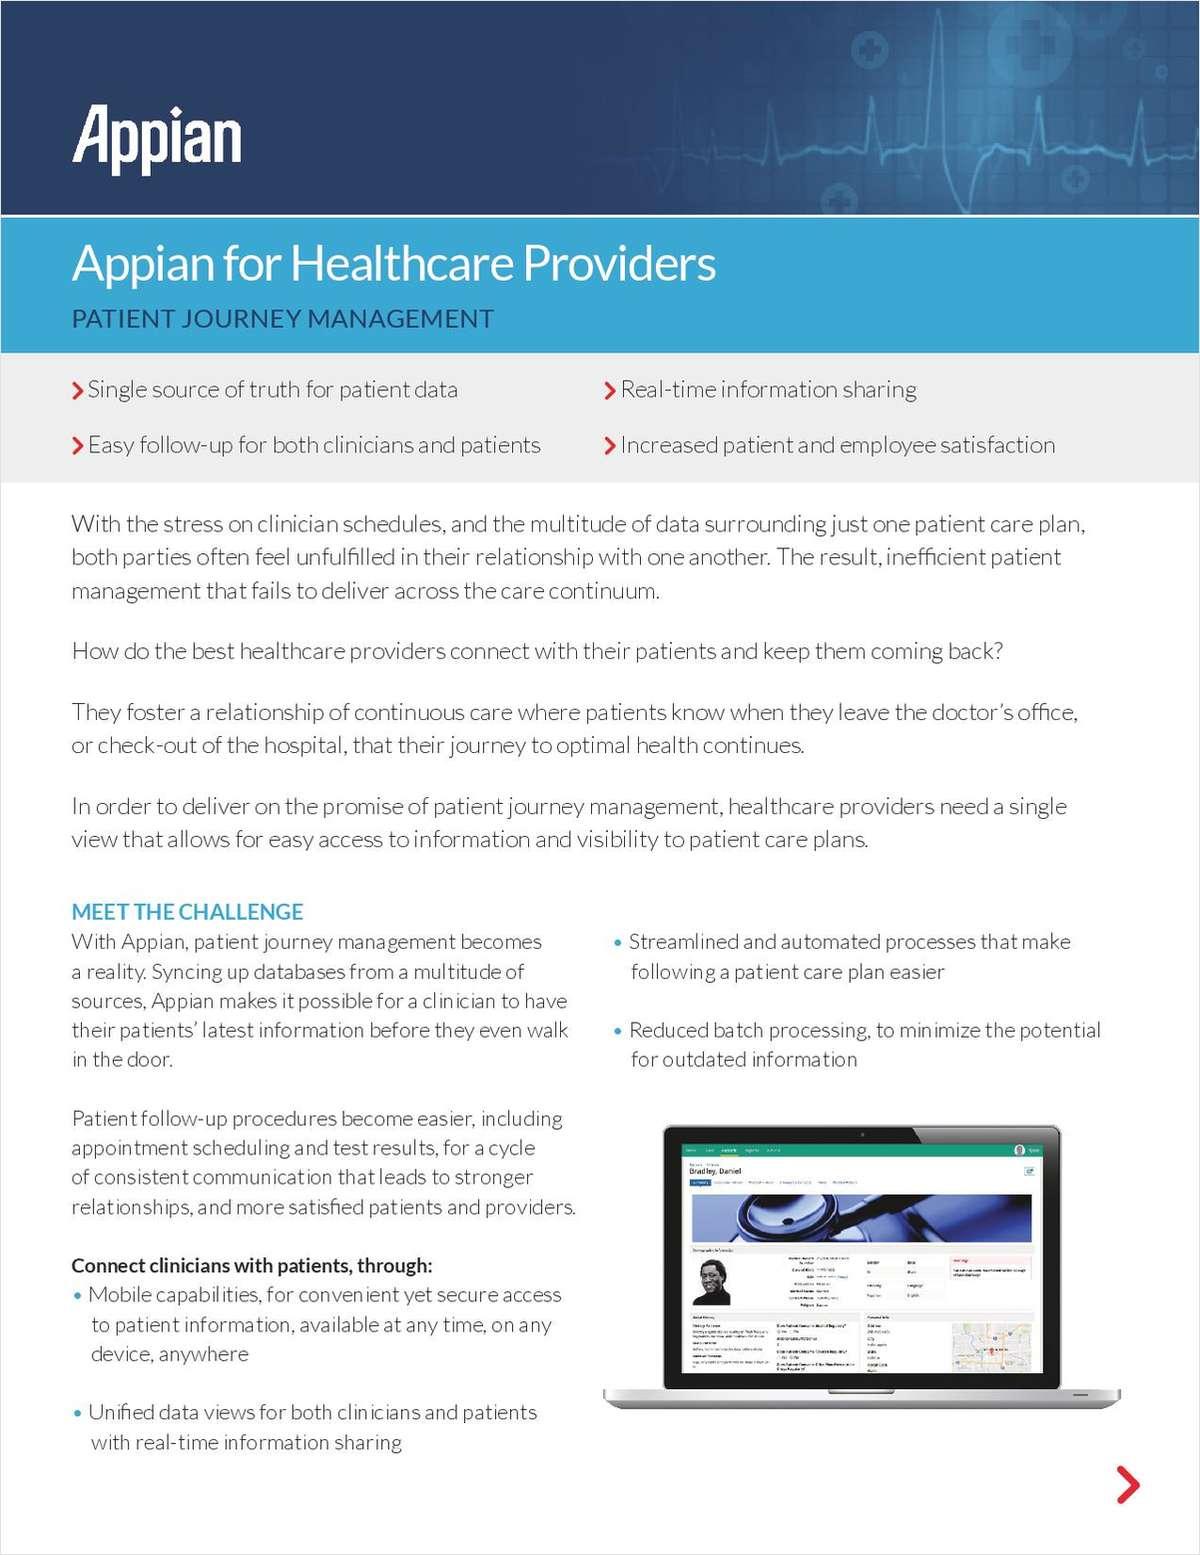 Appian for Healthcare Providers: Patient Journey Management